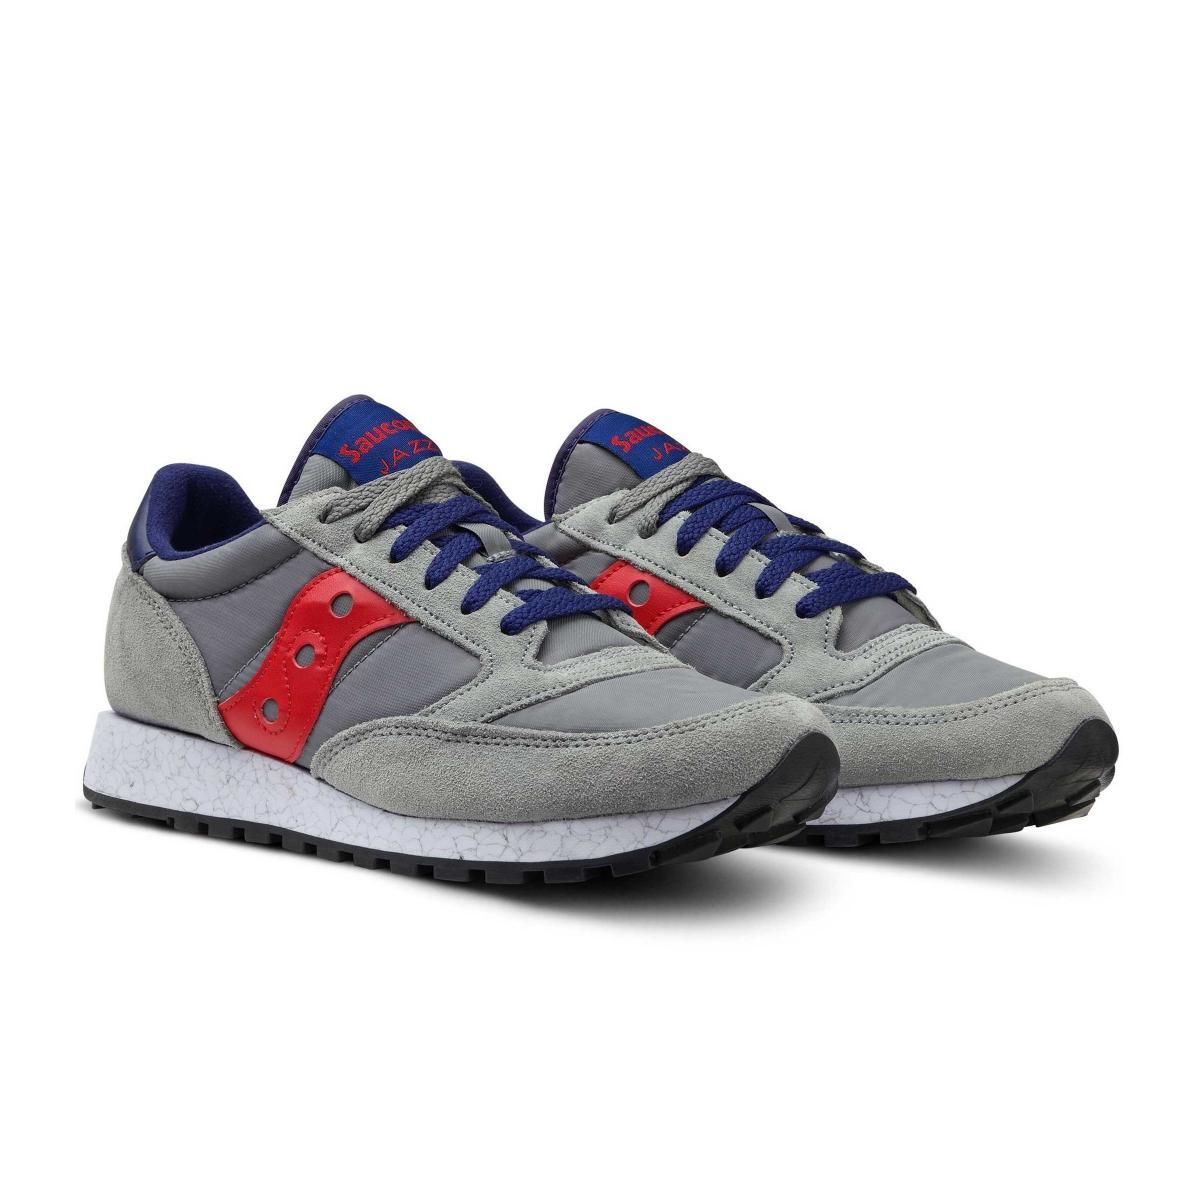 Scarpe Sneakers Saucony Jazz Original da uomo rif. S2044-516